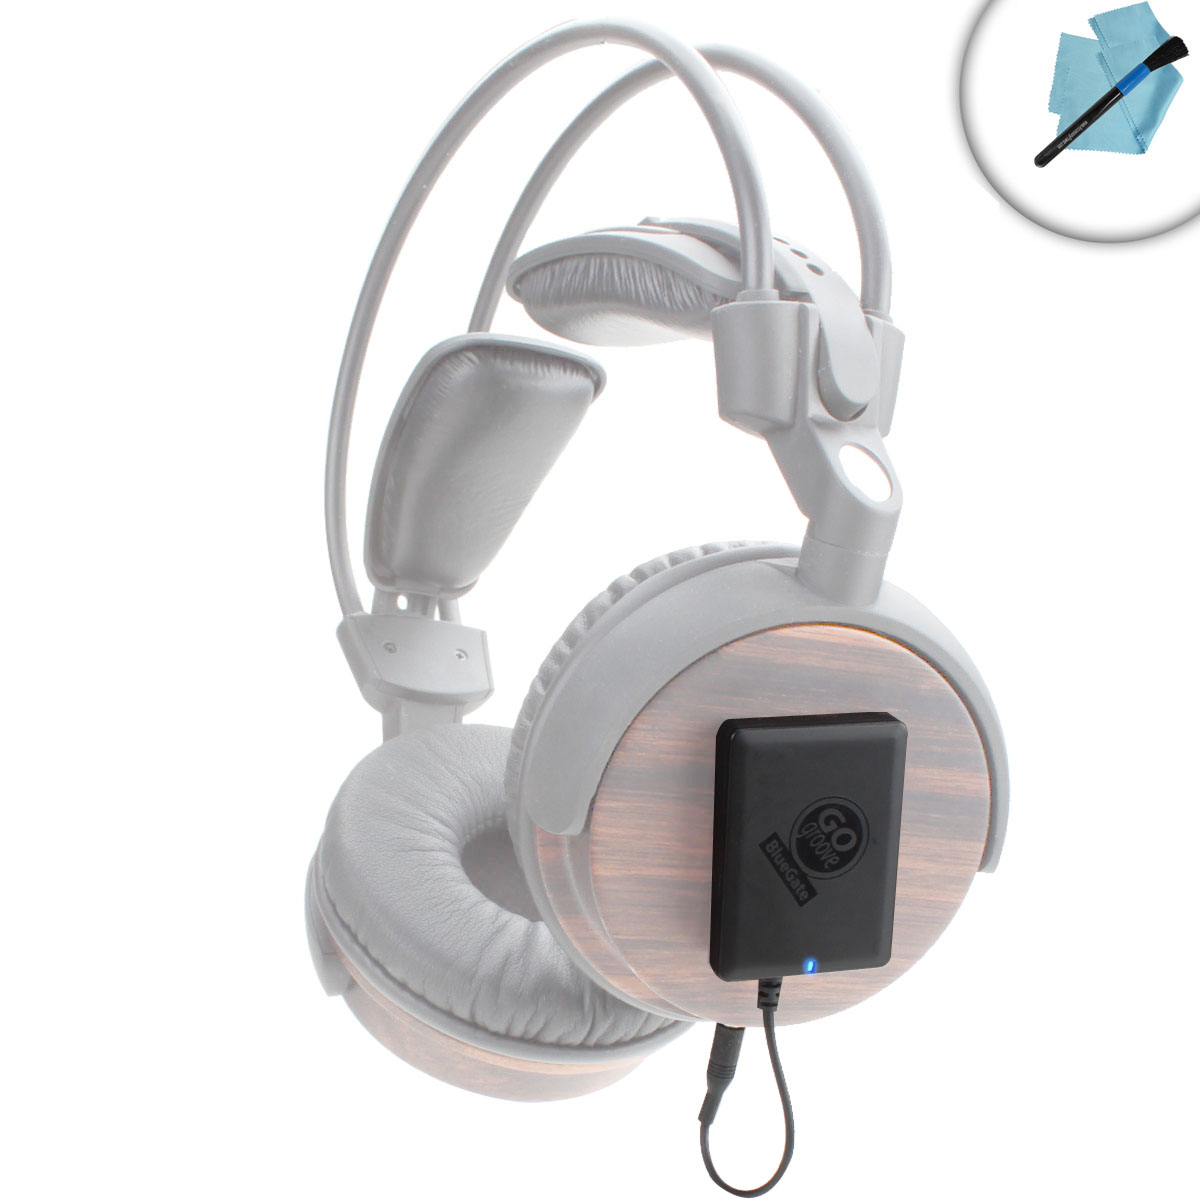 Blue tooth headphone earbuds - bluetooth headphone adapter transmitter